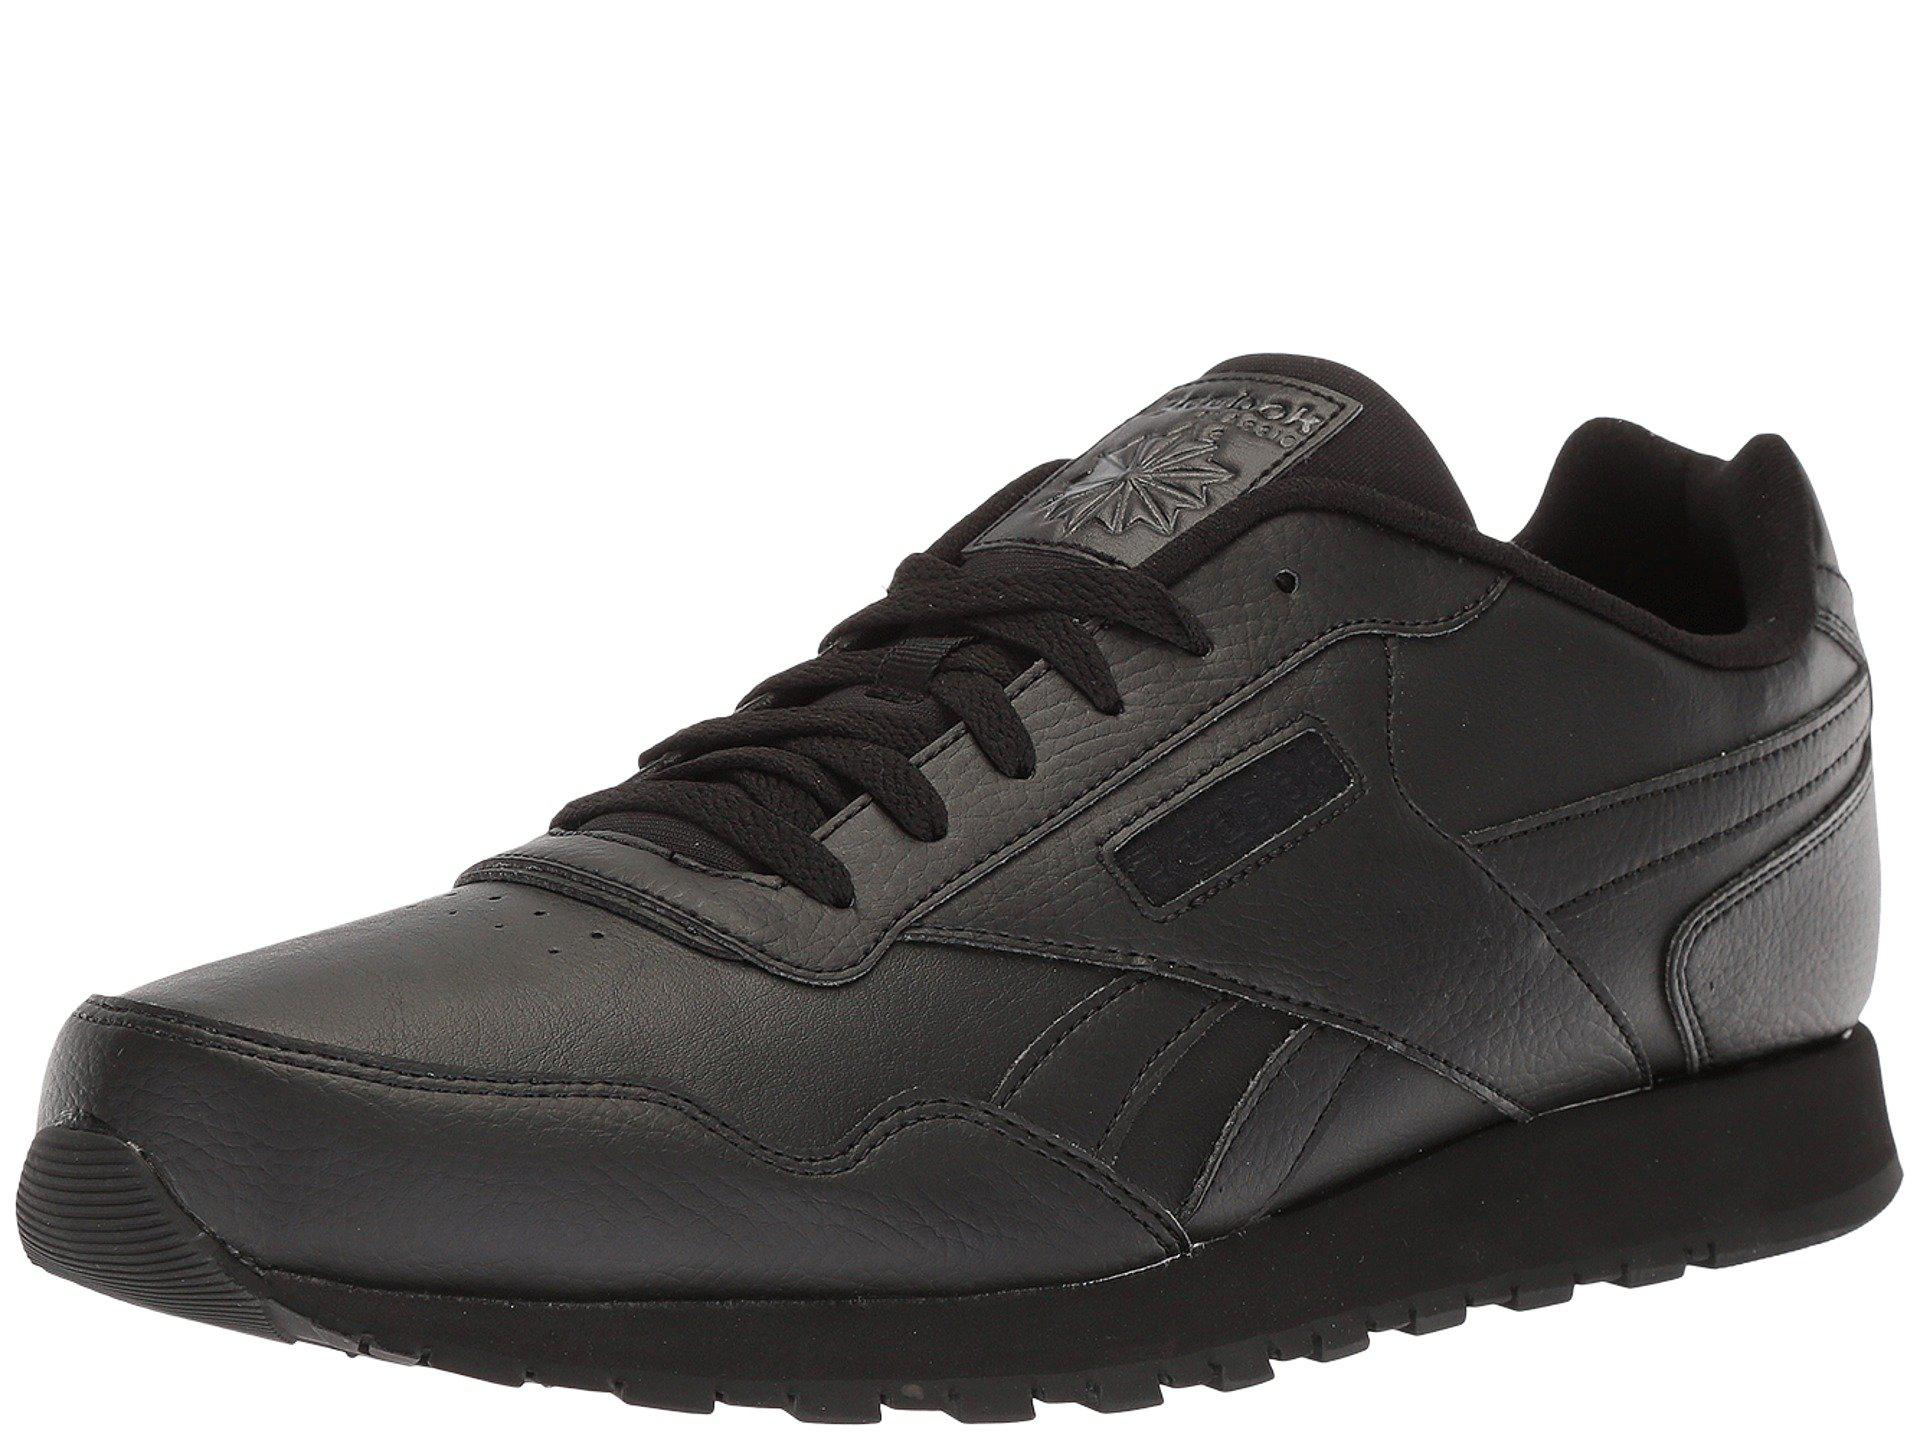 9acf4abdcfccaf Lyst reebok classic harman run in black for men jpg 1920x1440 Reebok  classic run